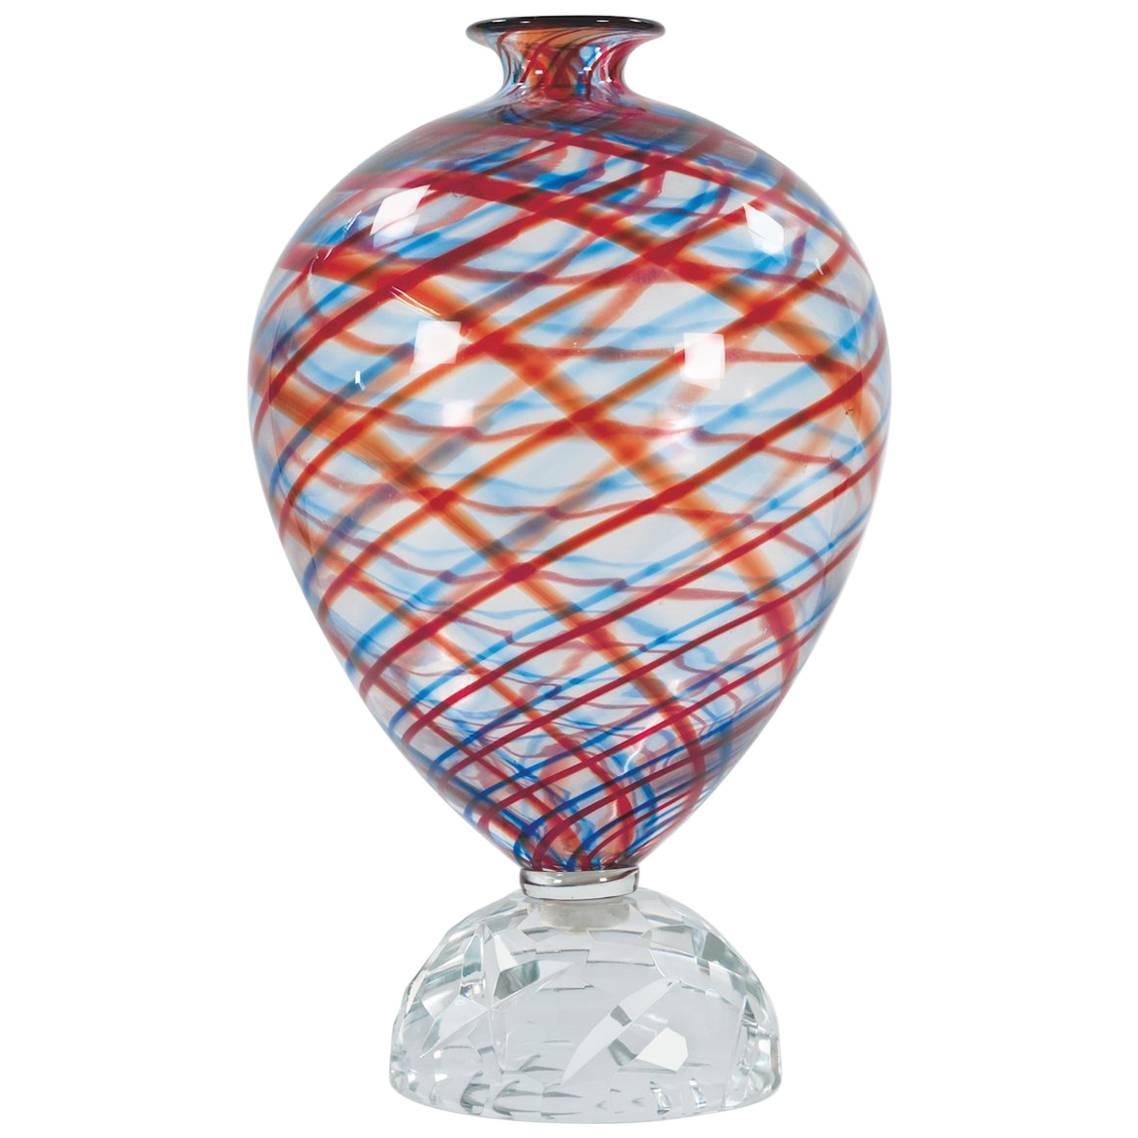 Italian Murano Glass Vase by Alessandro Mendini for Venini, Italy